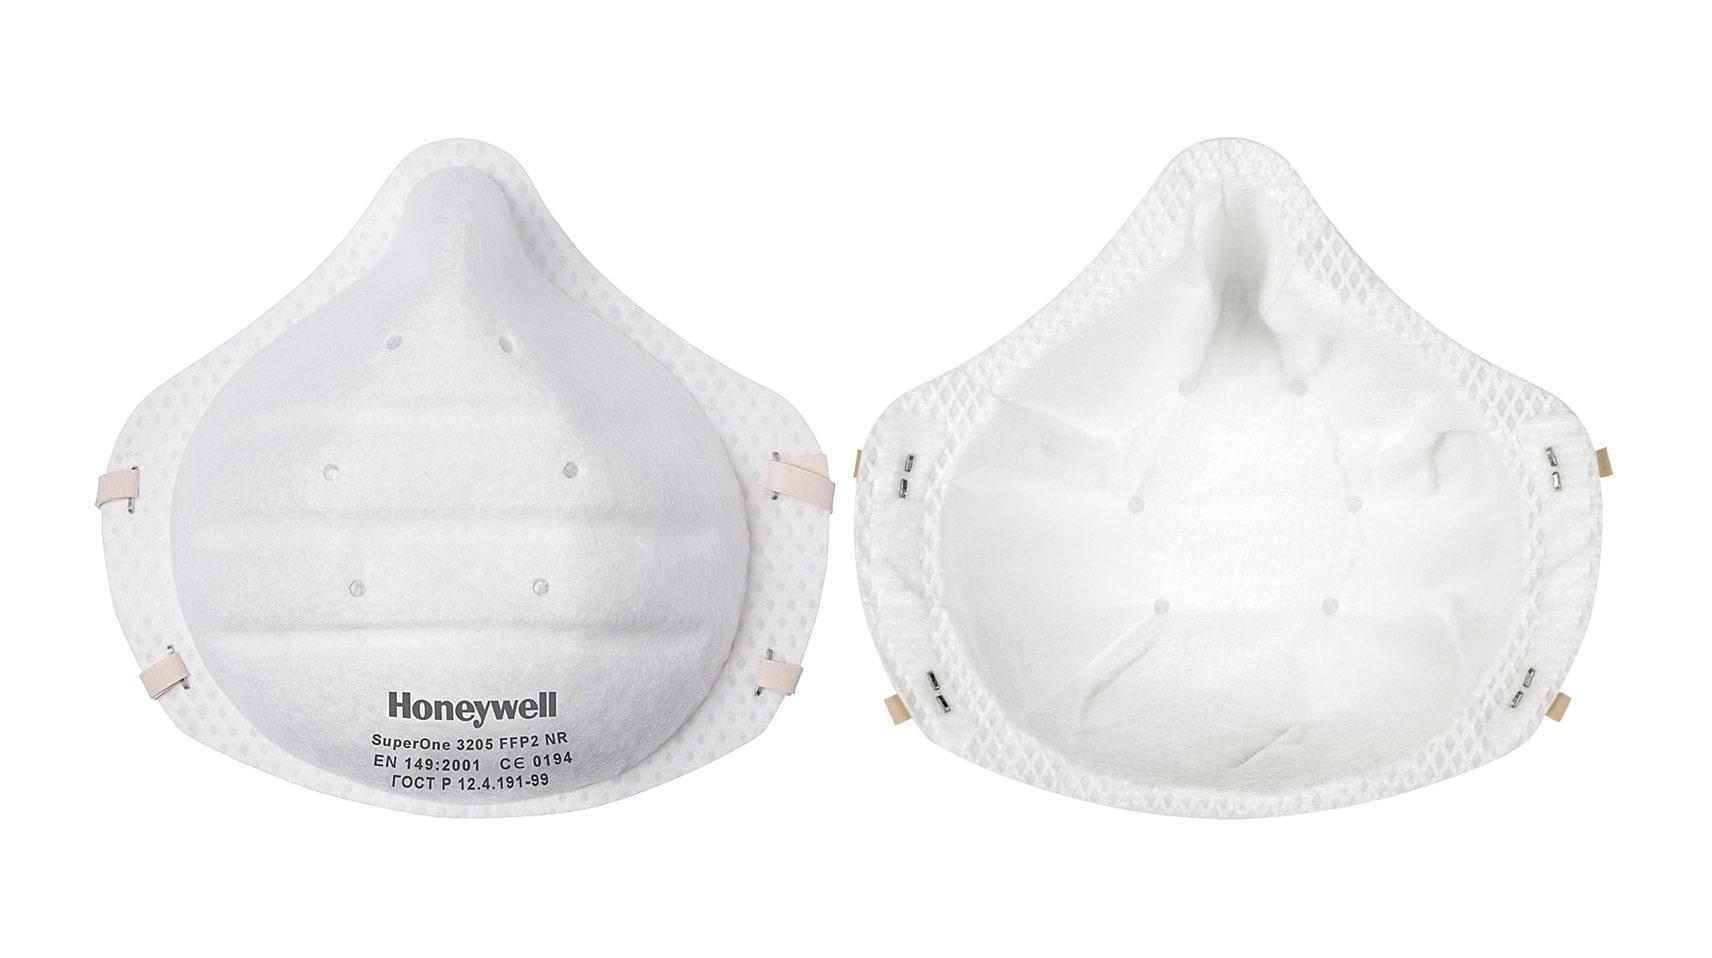 Респиратор за еднократна употреба Honeywell SuperOne 3205 FFP2 - 30 бр.